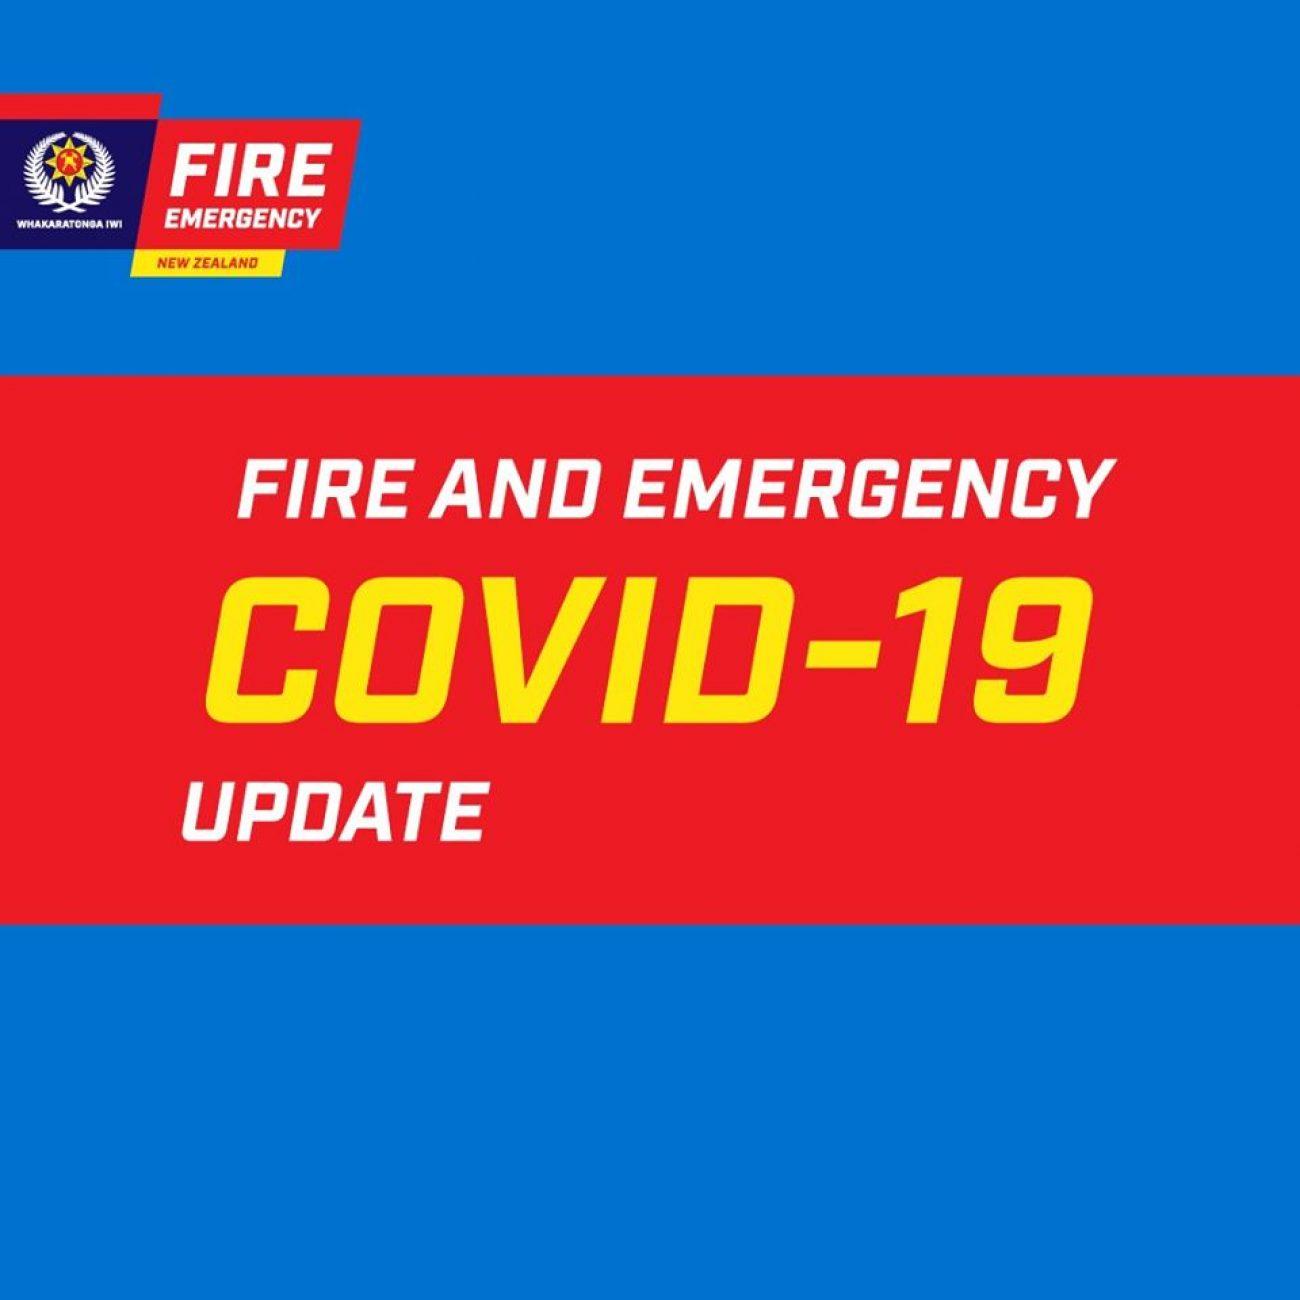 Message from Fire & Emergency NZ